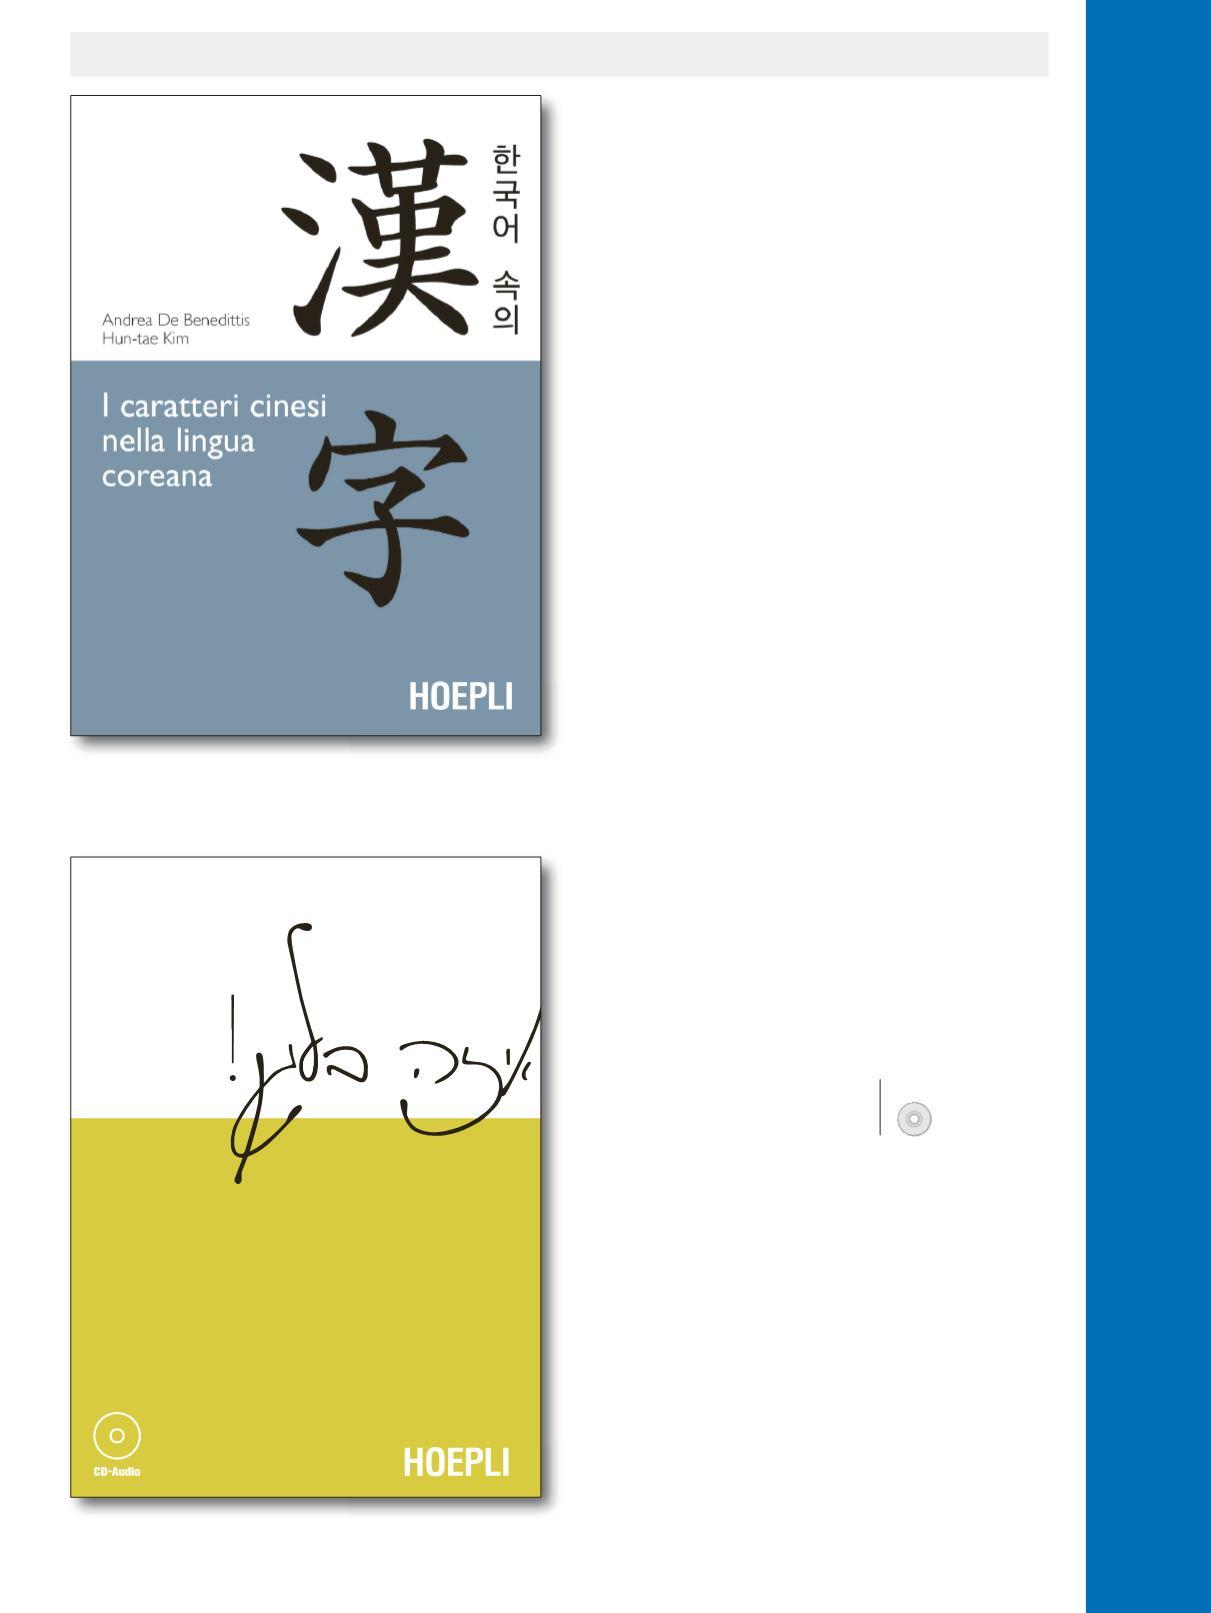 Catalogo Lingue 2015 - HOEPLI - page 27. >